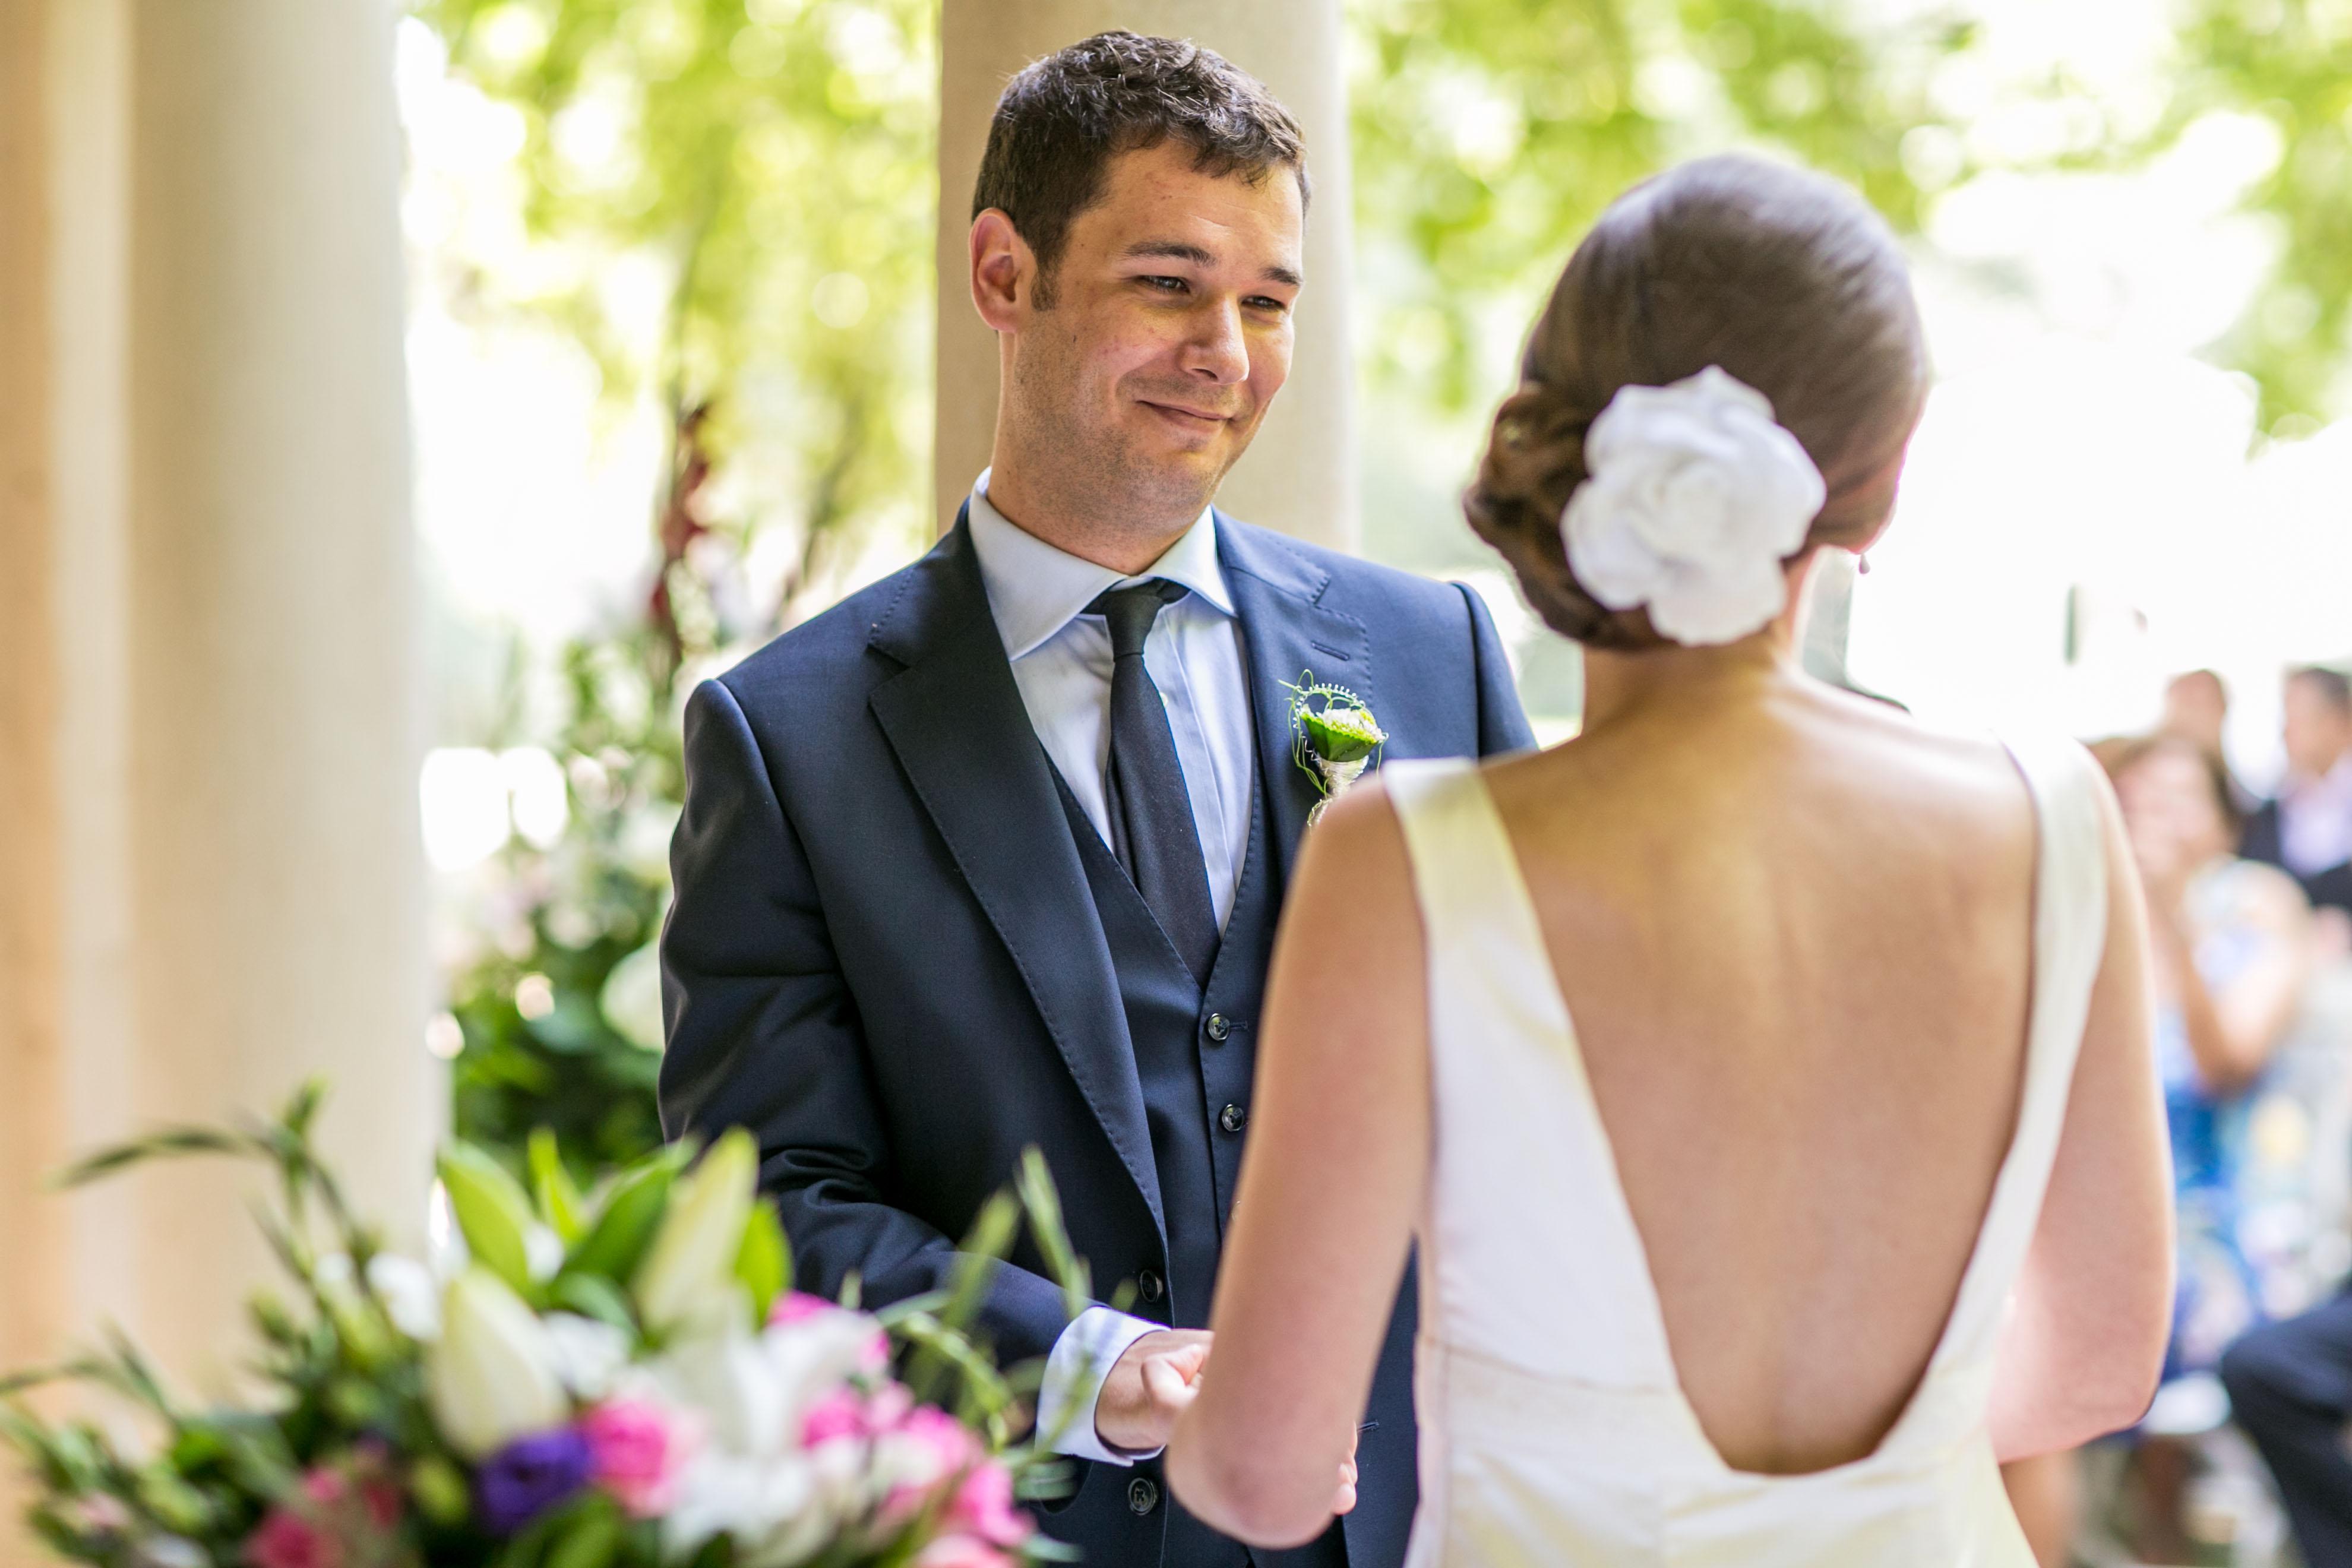 Fran Burrows Hochzeitsfotografie_shopandmarry.de-12